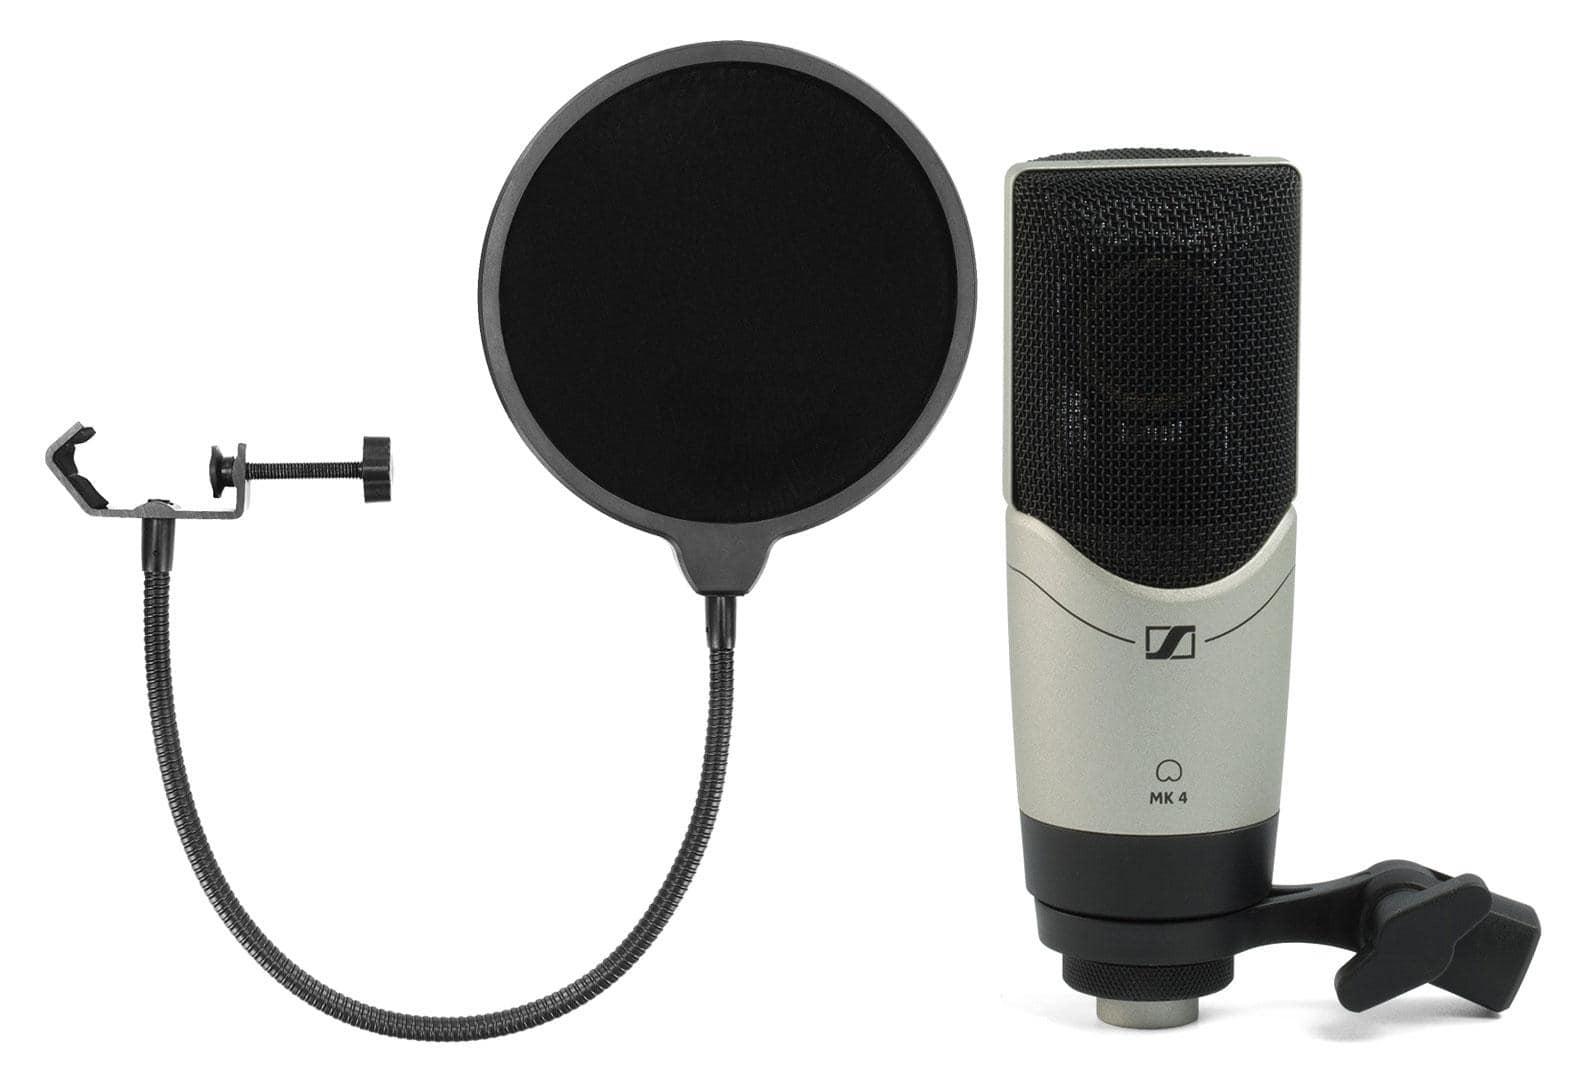 Sennheiser MK4 Kondensatormikrofon Set inkl. Popkiller